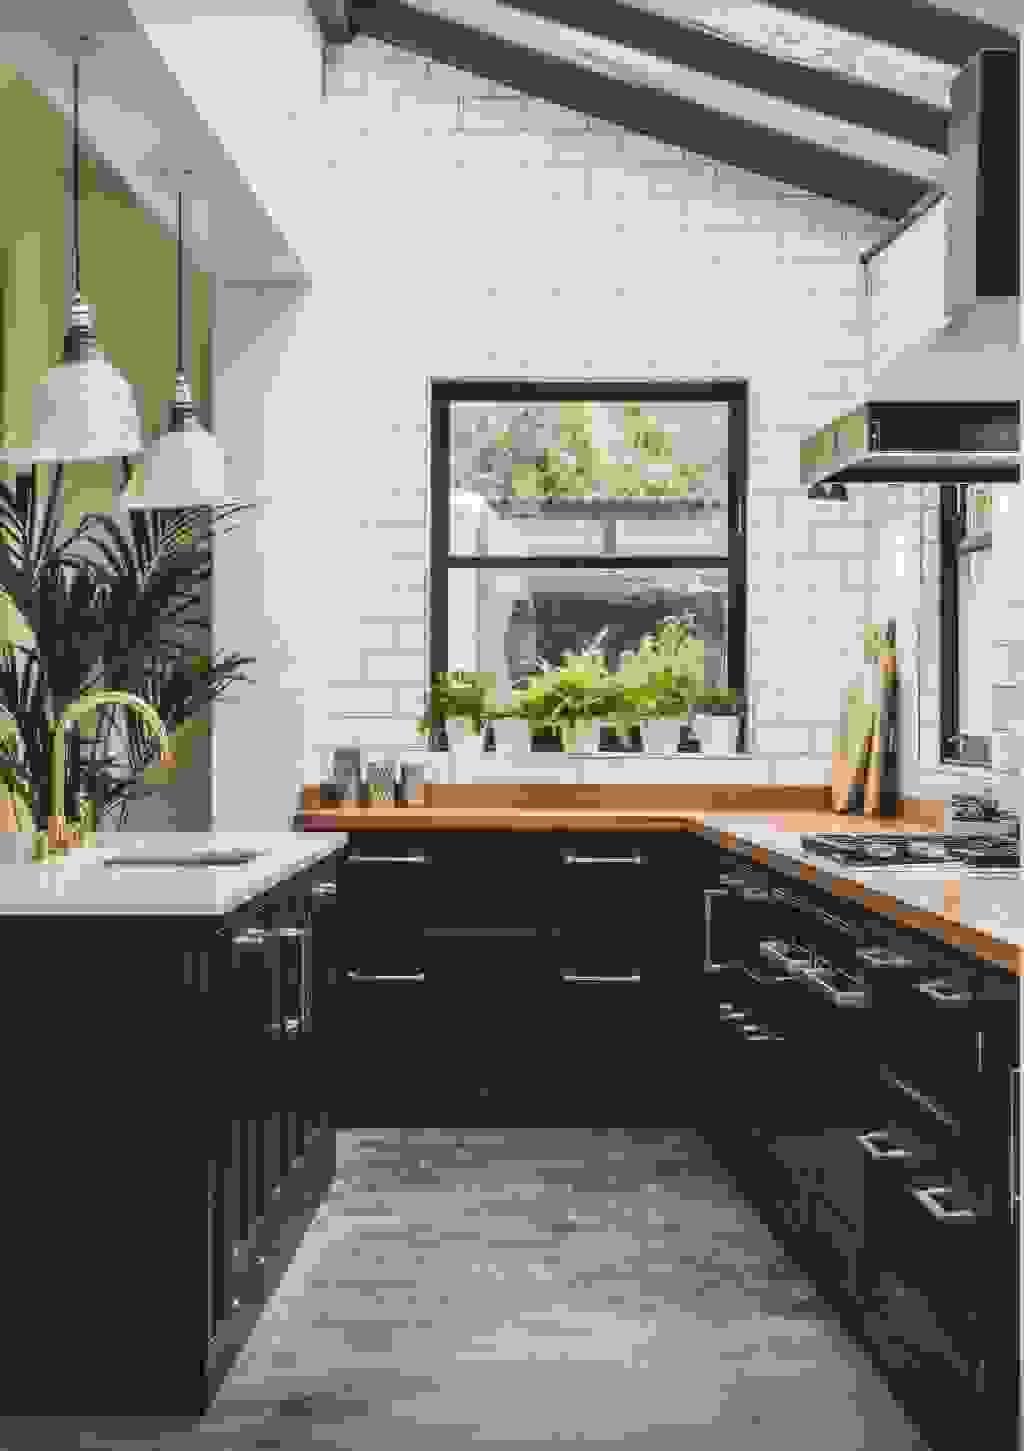 Minimalist kitchen | Source: feasthome.com